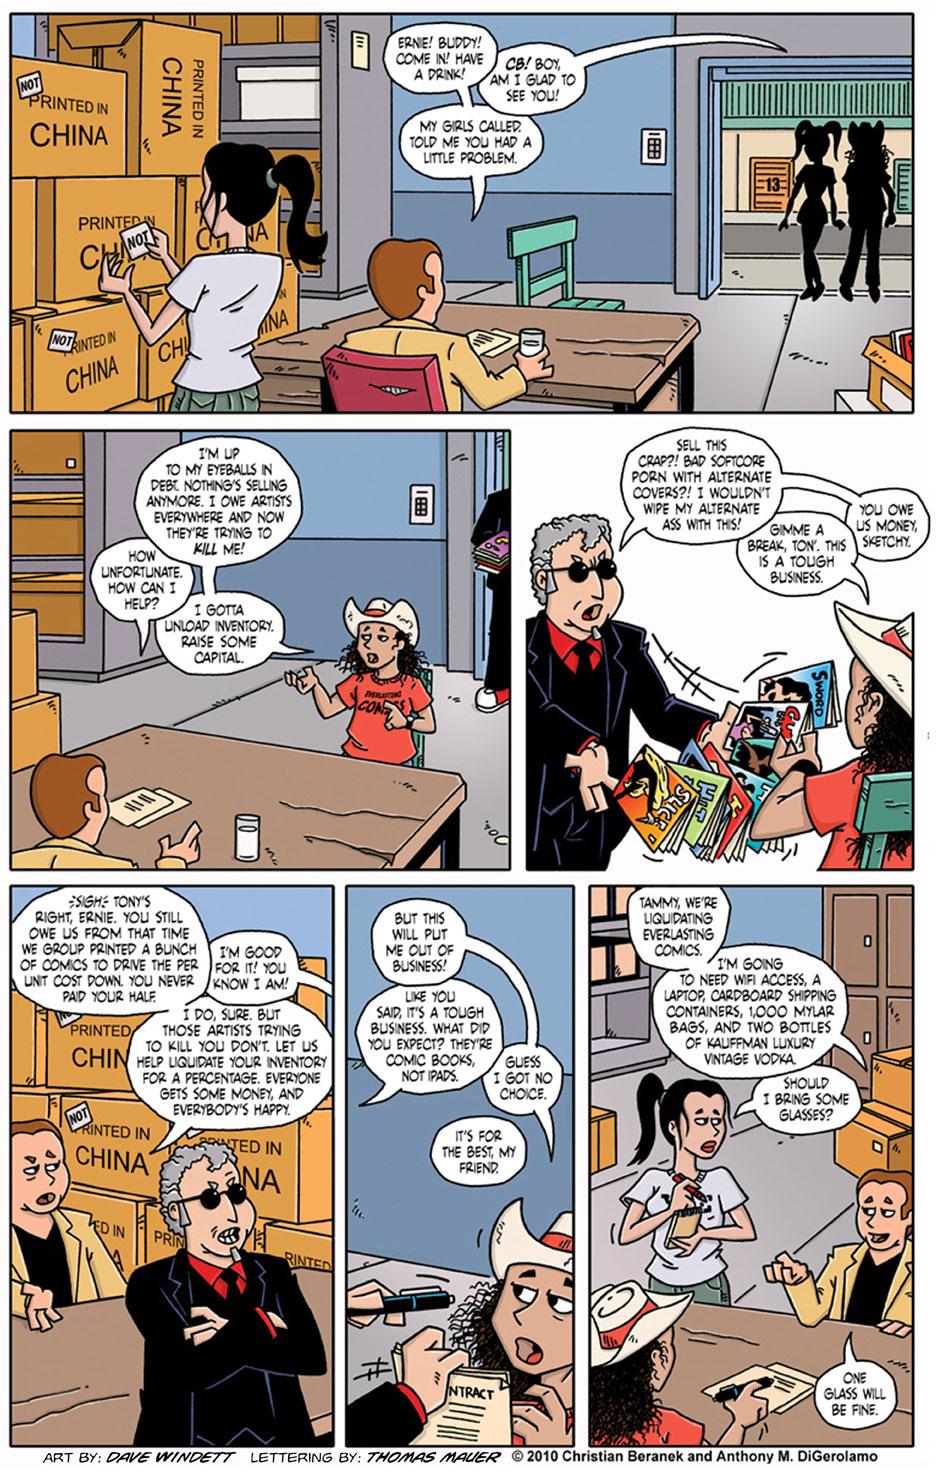 Comic Book Mafia #10: Ernie Gets a Sitdown